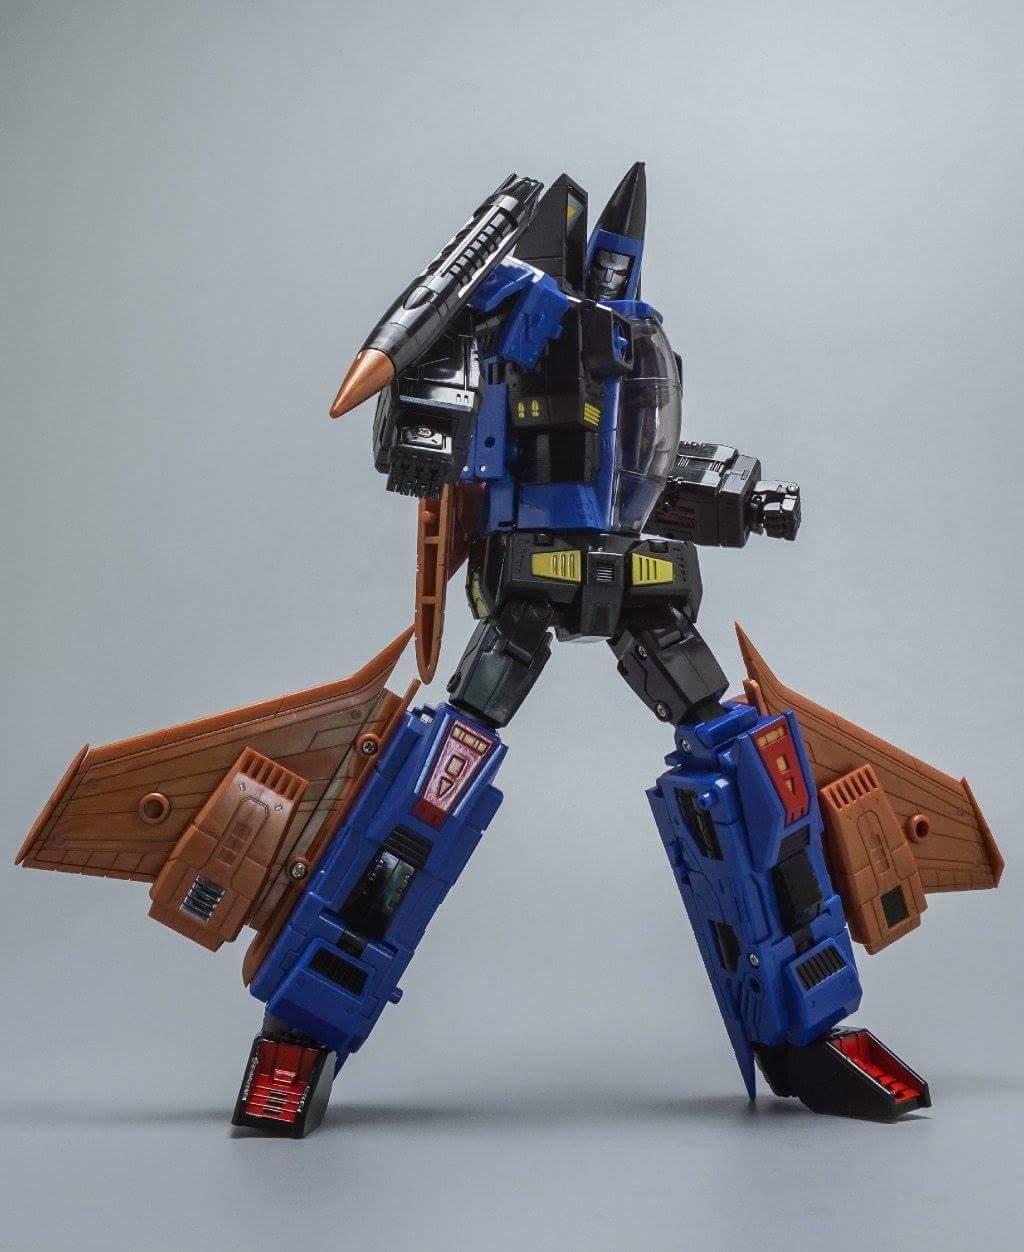 [ToyWorld] Produit Tiers - TW-M02A Combustor (Ramjet/Statoréacto), TW-M02B Assault (Thrust/Fatalo), TW-M02C Requiem (Dirge/Funébro) - Page 2 UUfihcmE